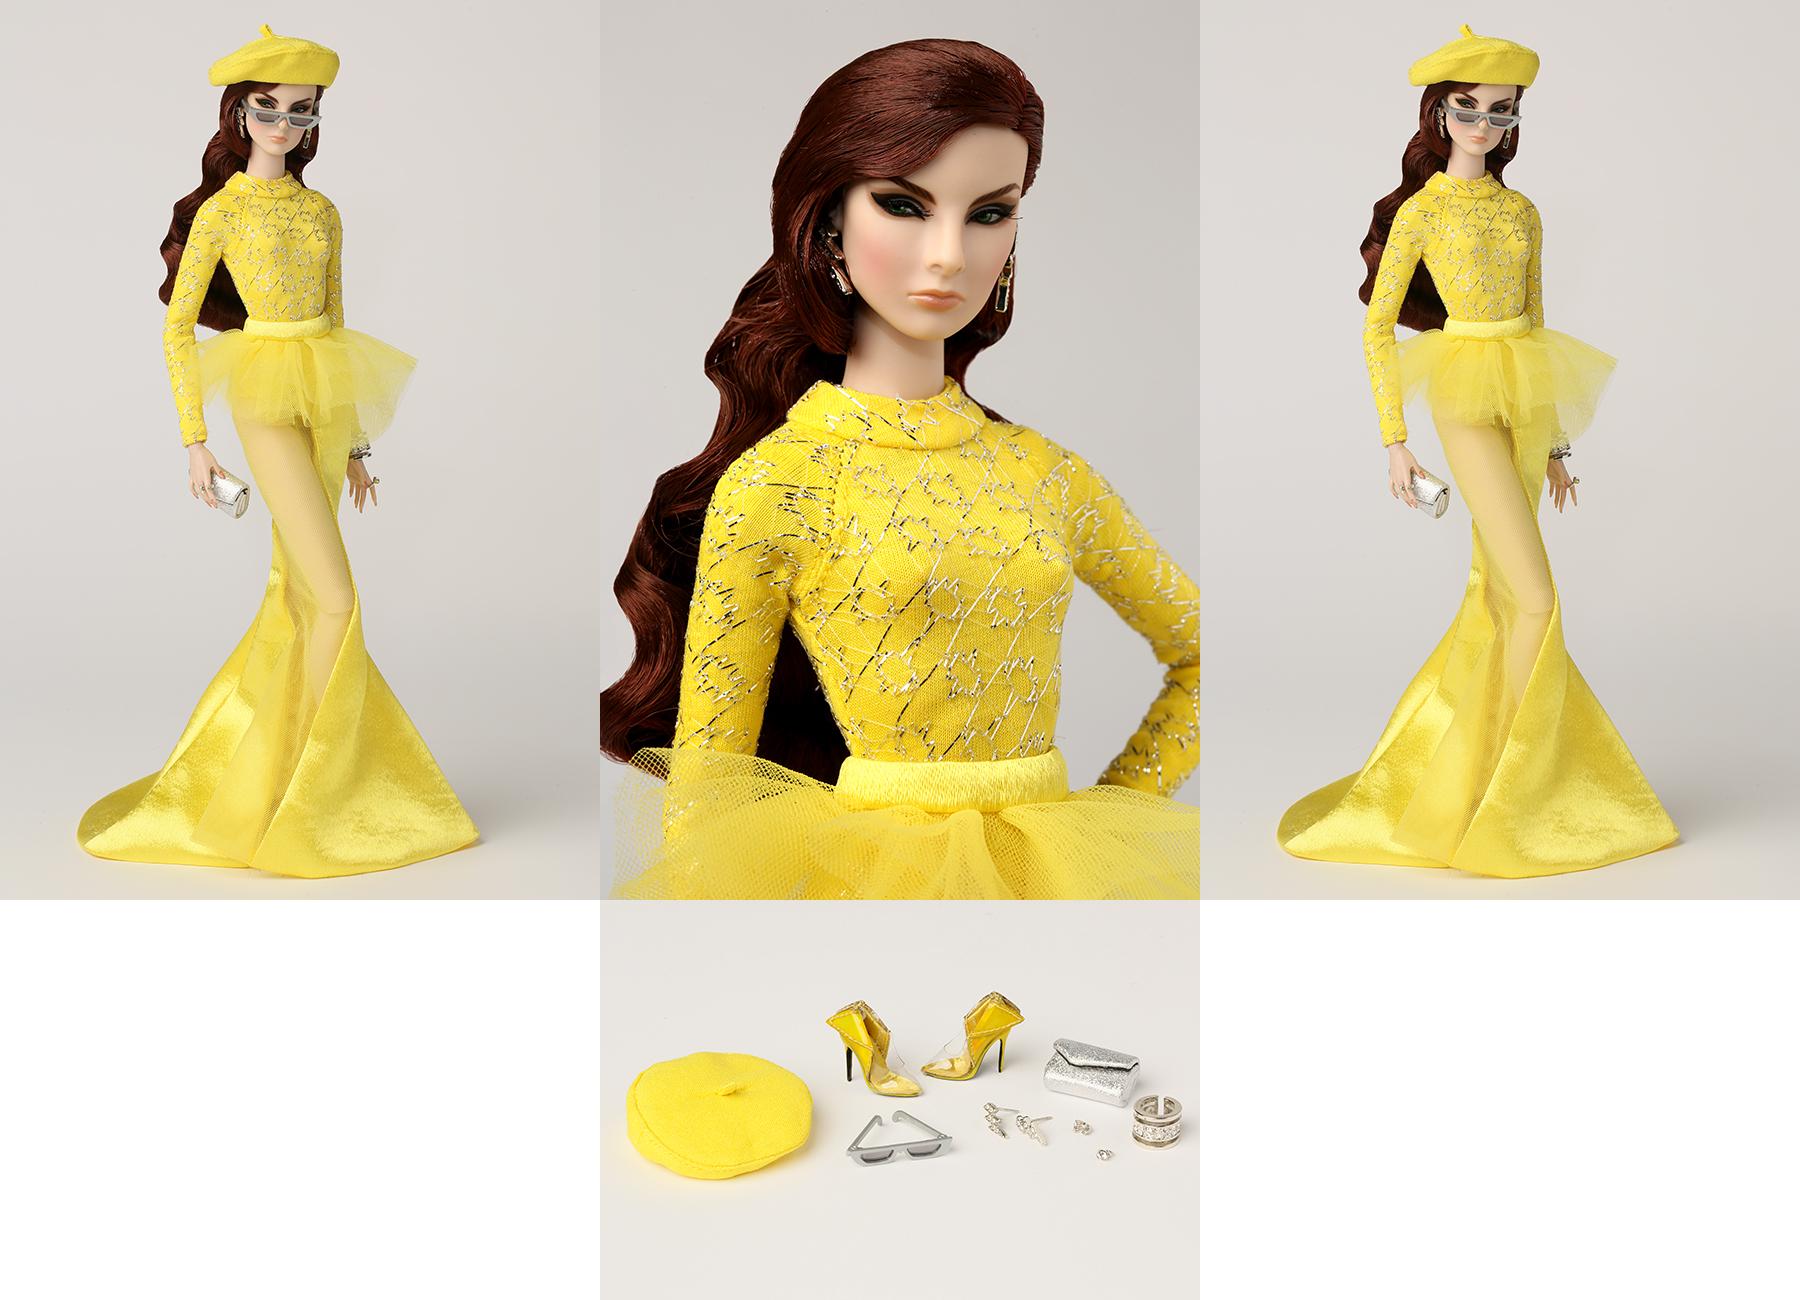 2018 Evening Dresses Fashion Royalty Doll